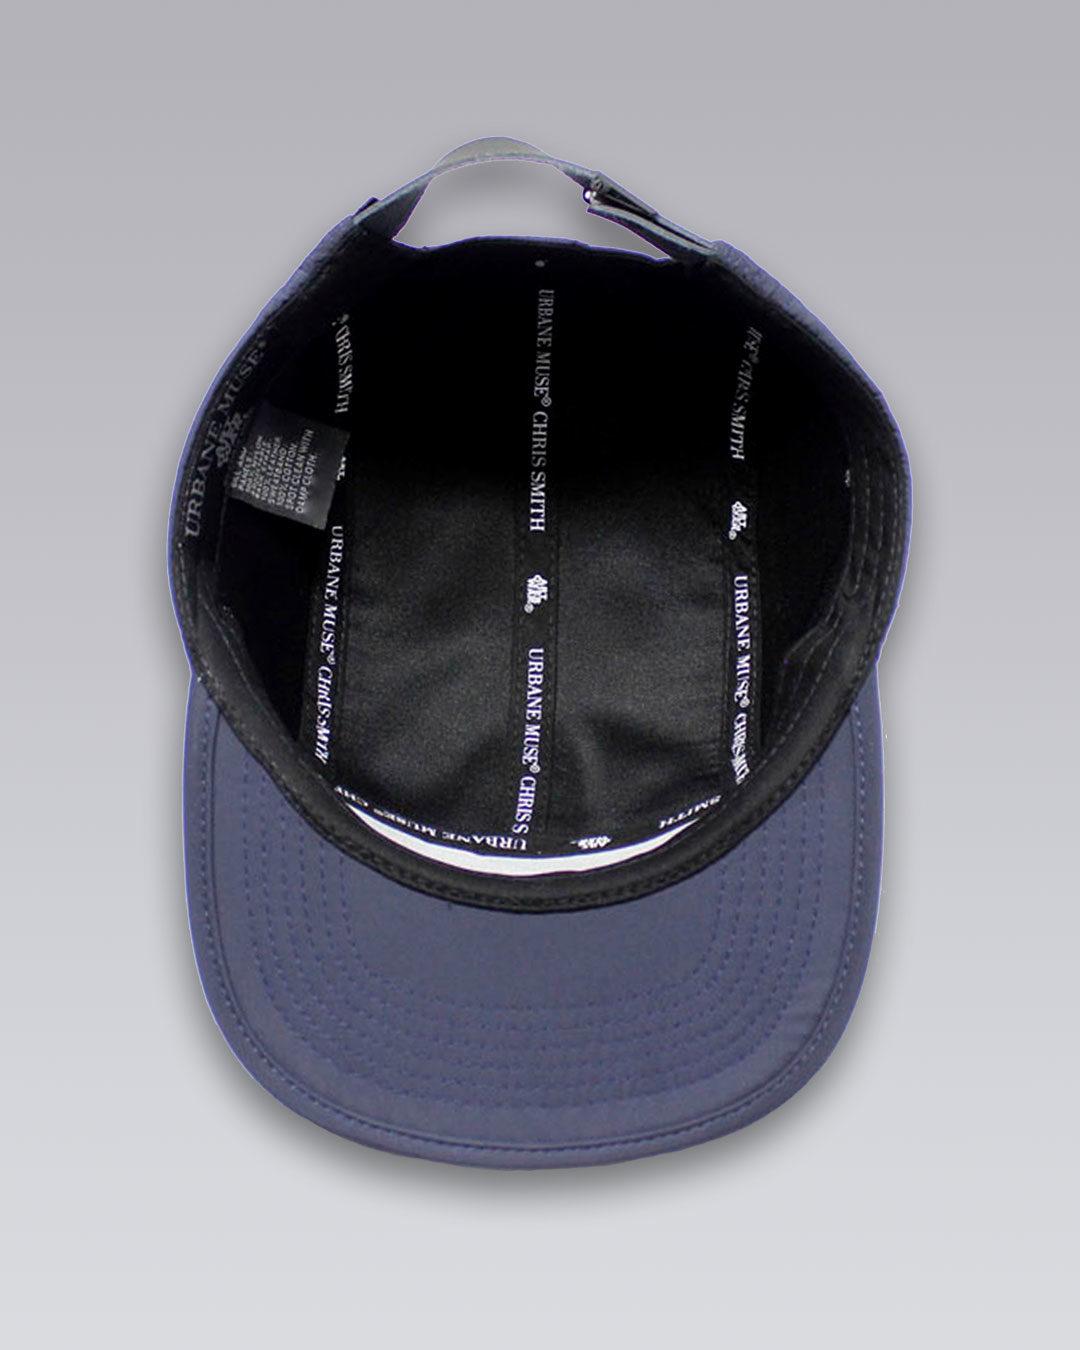 URBANE-MUSE-CHRIS-SMITH-Navy-UM-nylon-five-panel-hat-e